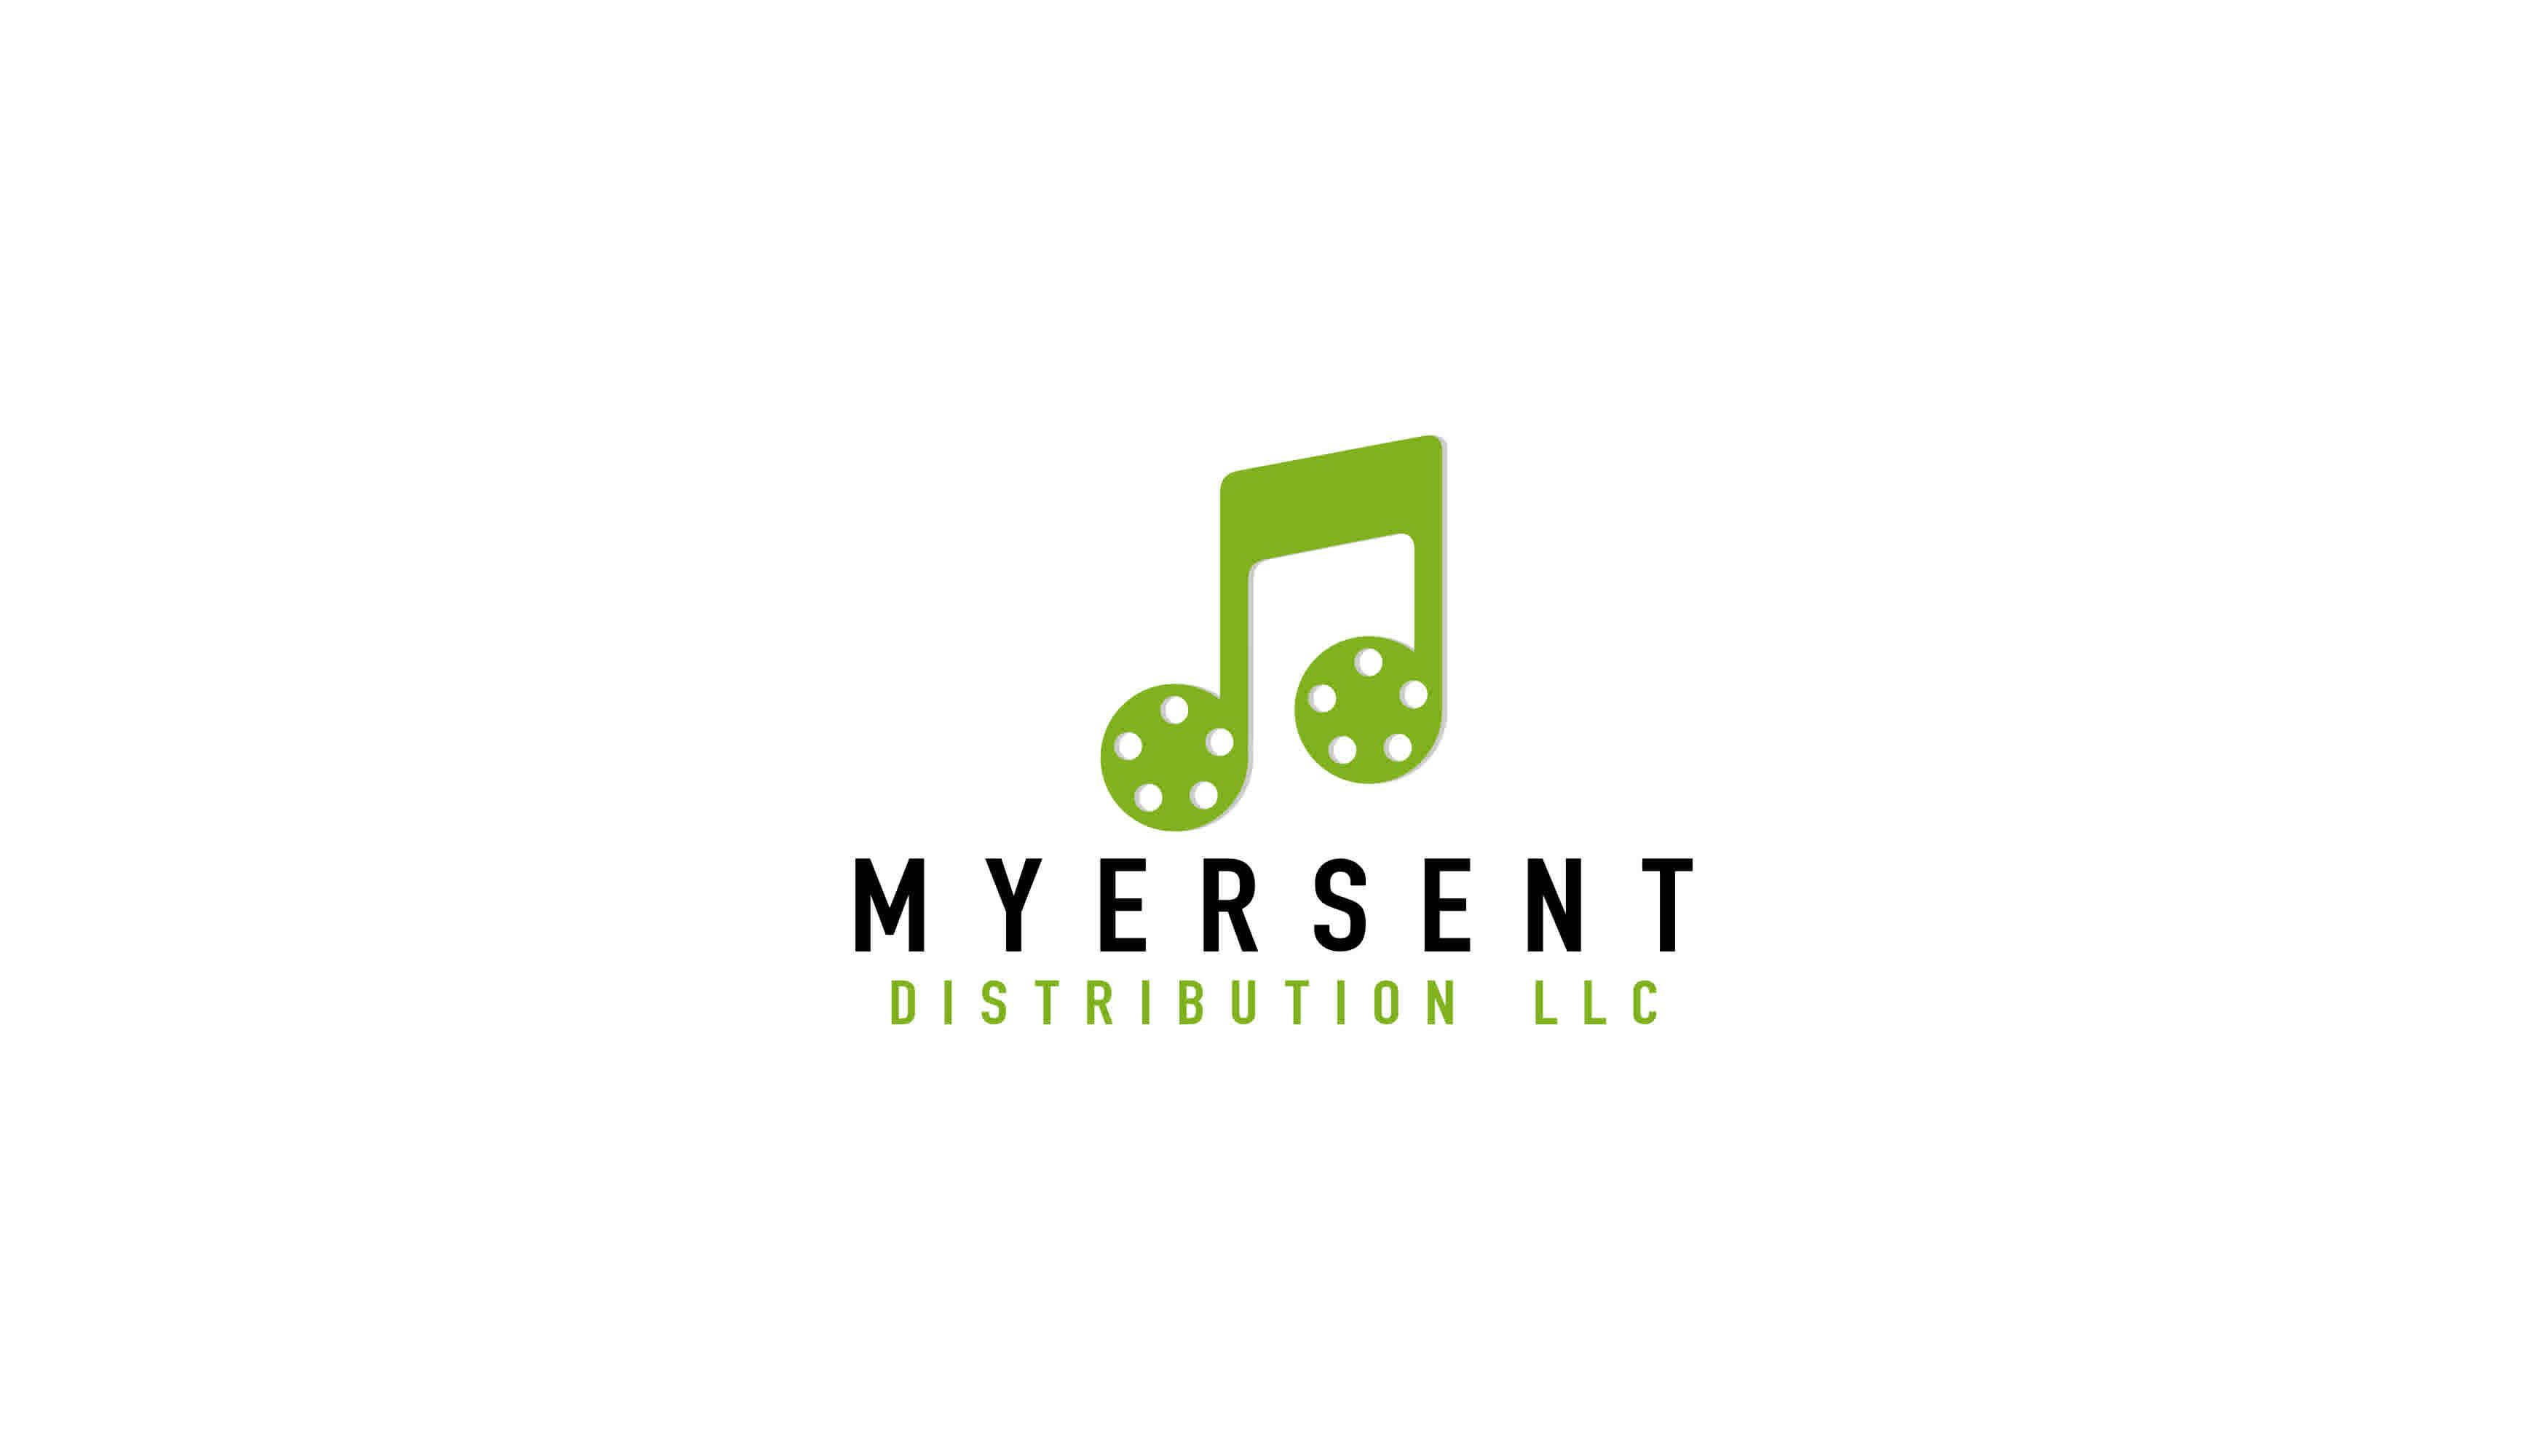 MyersEntDistribution LLC